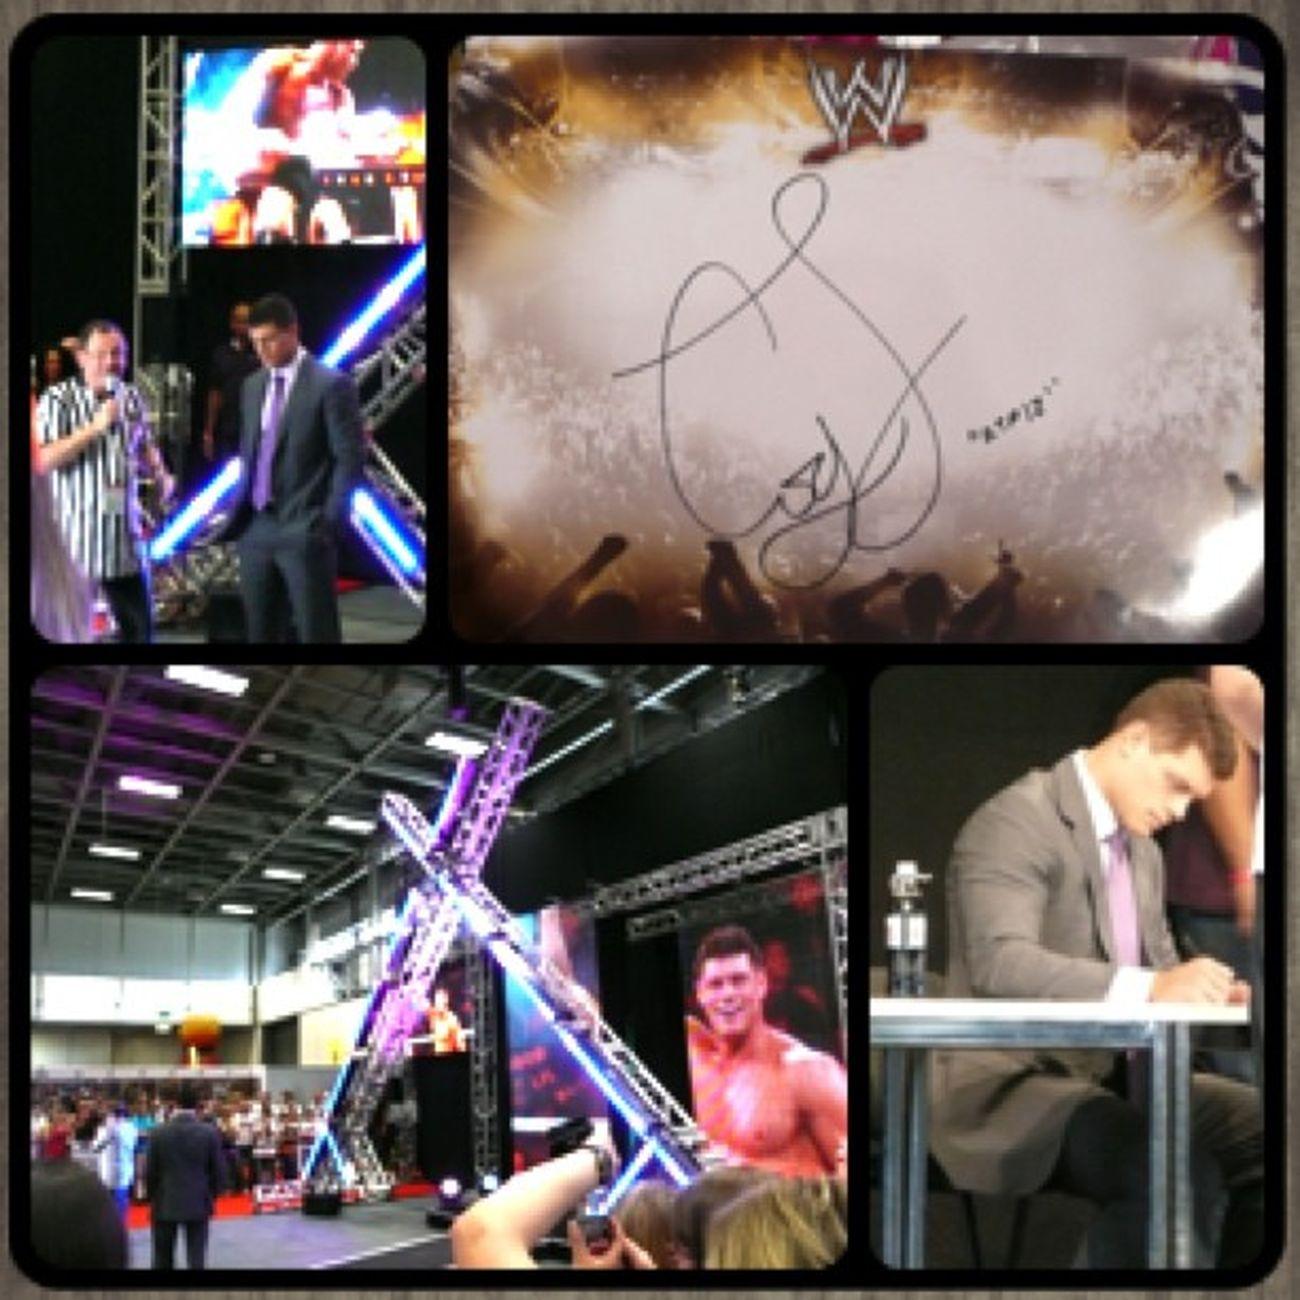 Cody Rhodes in Berlin Berlin Wwe Autograph Wweuniverse Dashing Smackdown Codyrhodes Youmesse